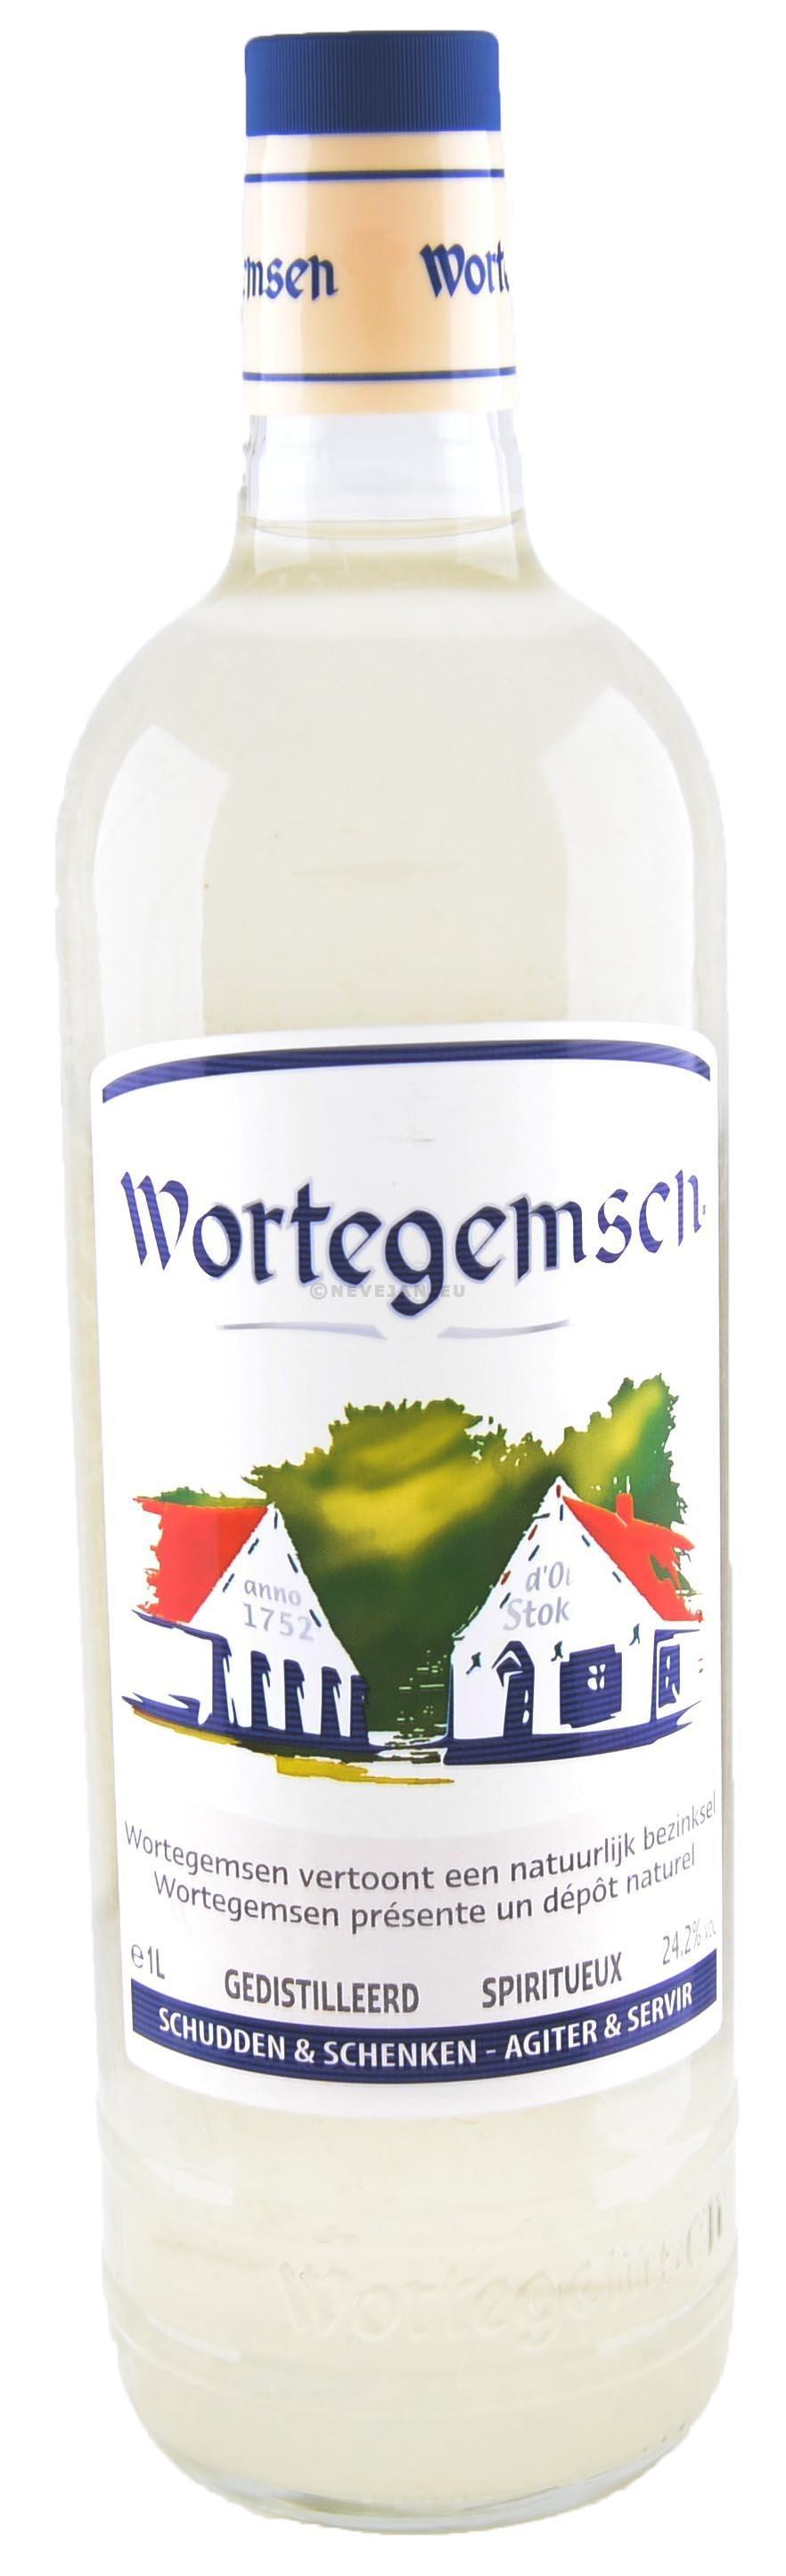 Wortegemsen citroenjenever 1L 24.2%